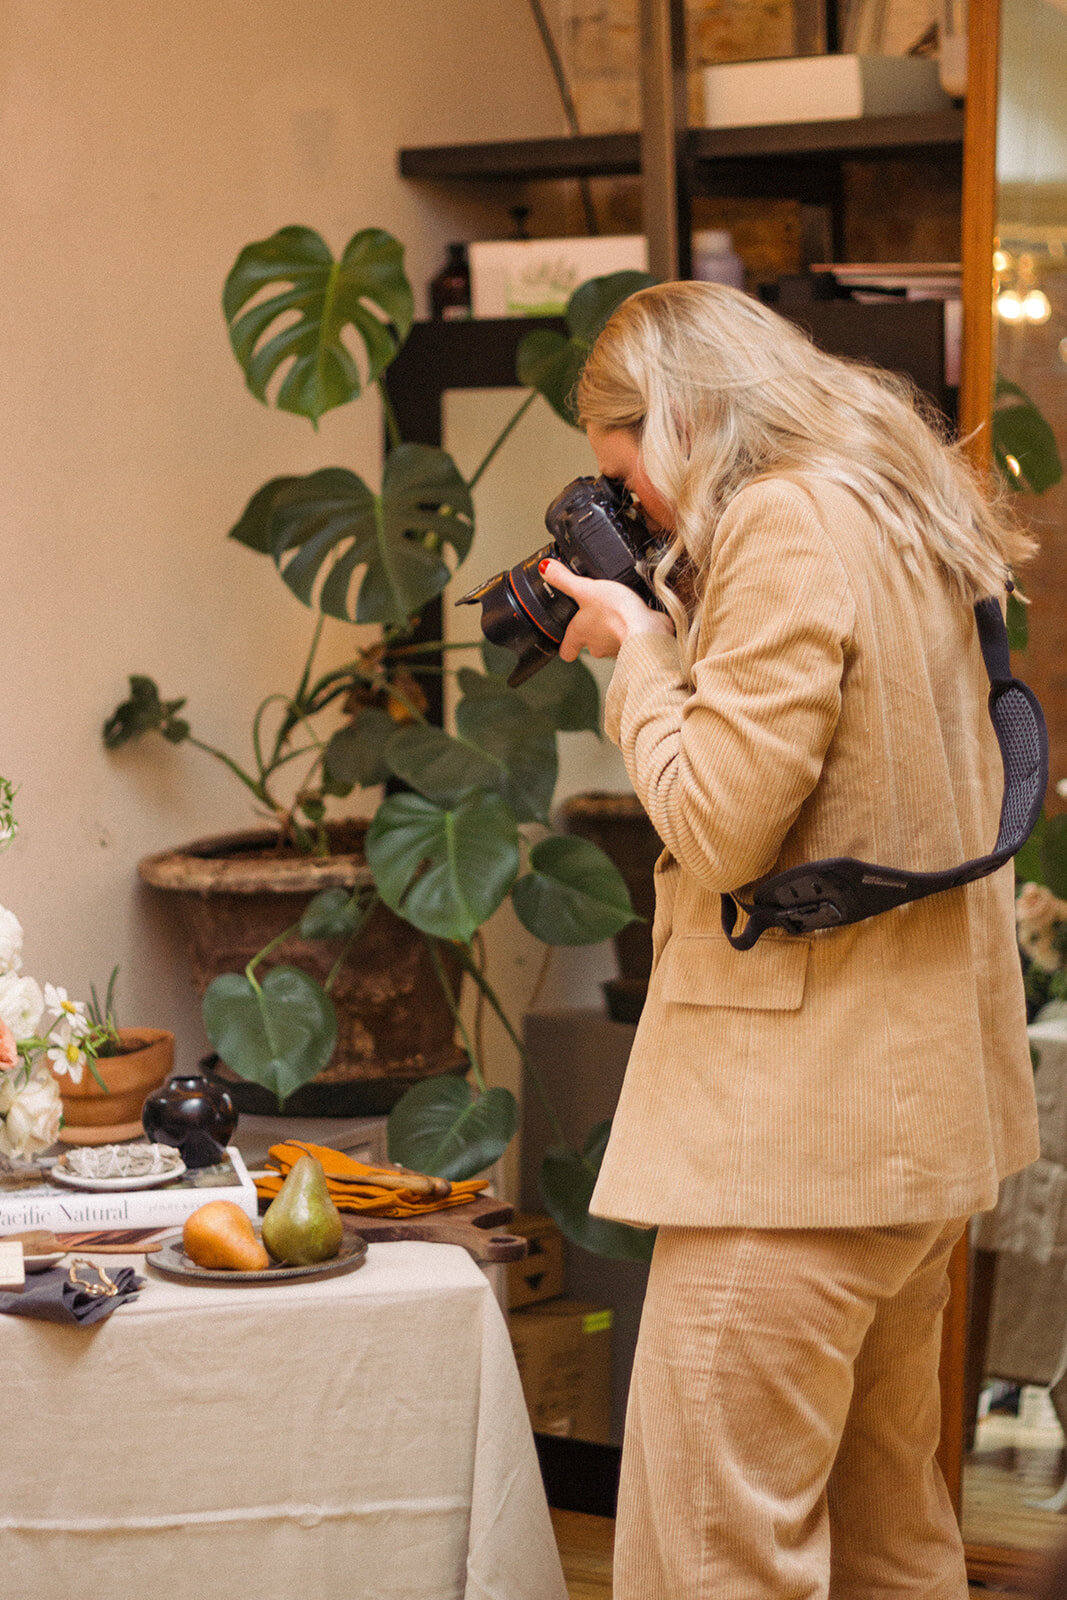 Photography-101-Workshop-Spokane-WA-Alycia-Lovell-Photography-She-Is-Vested-32.jpg